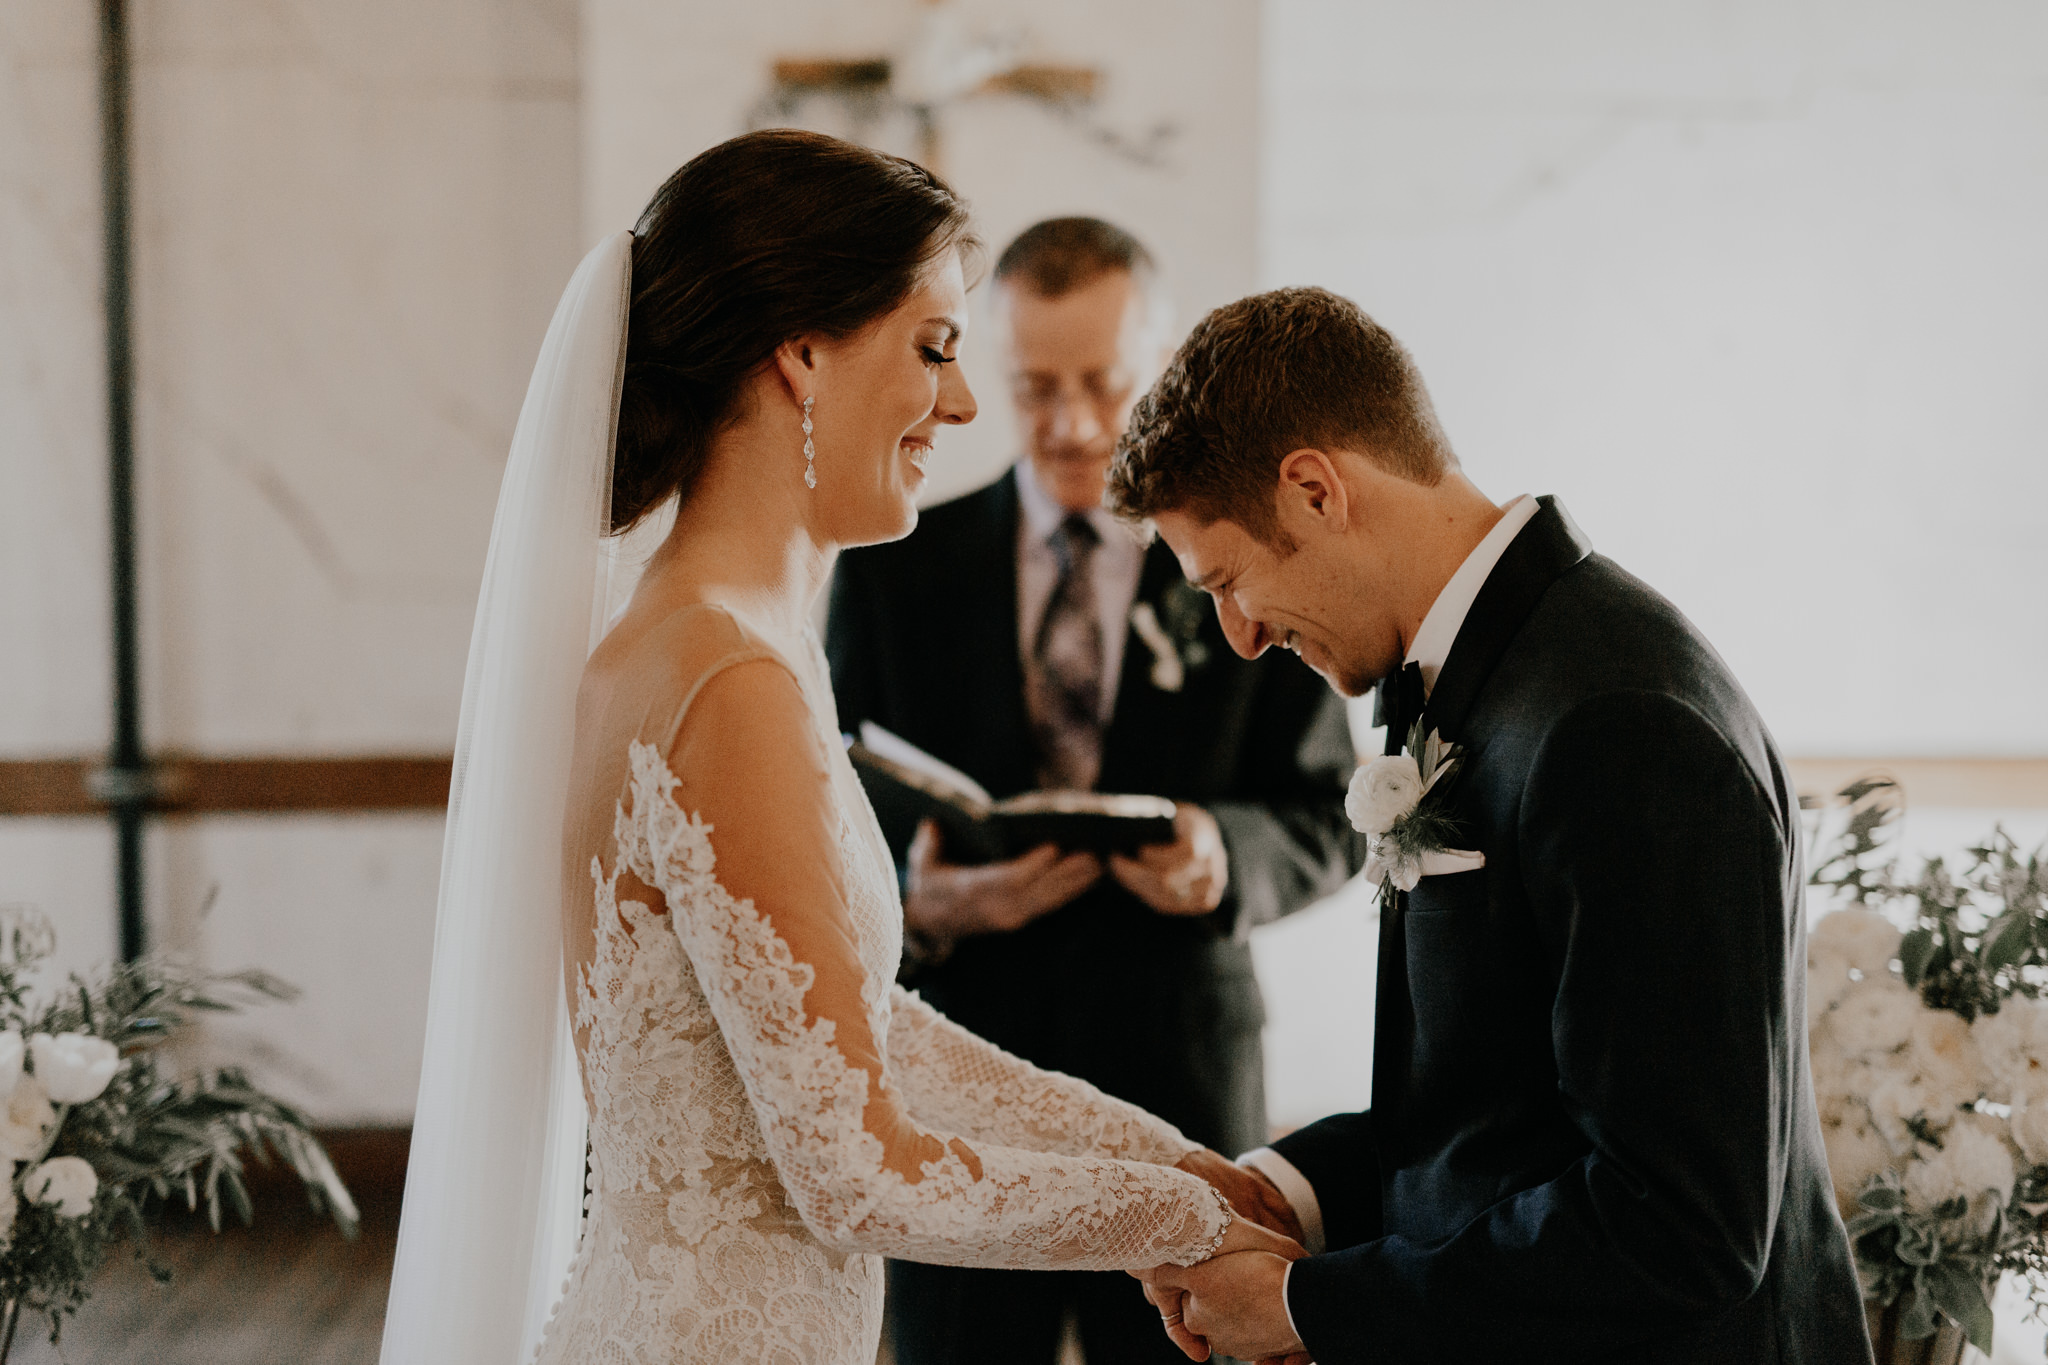 wedding-headlands-center-for-the-arts-sausalito-80.jpg